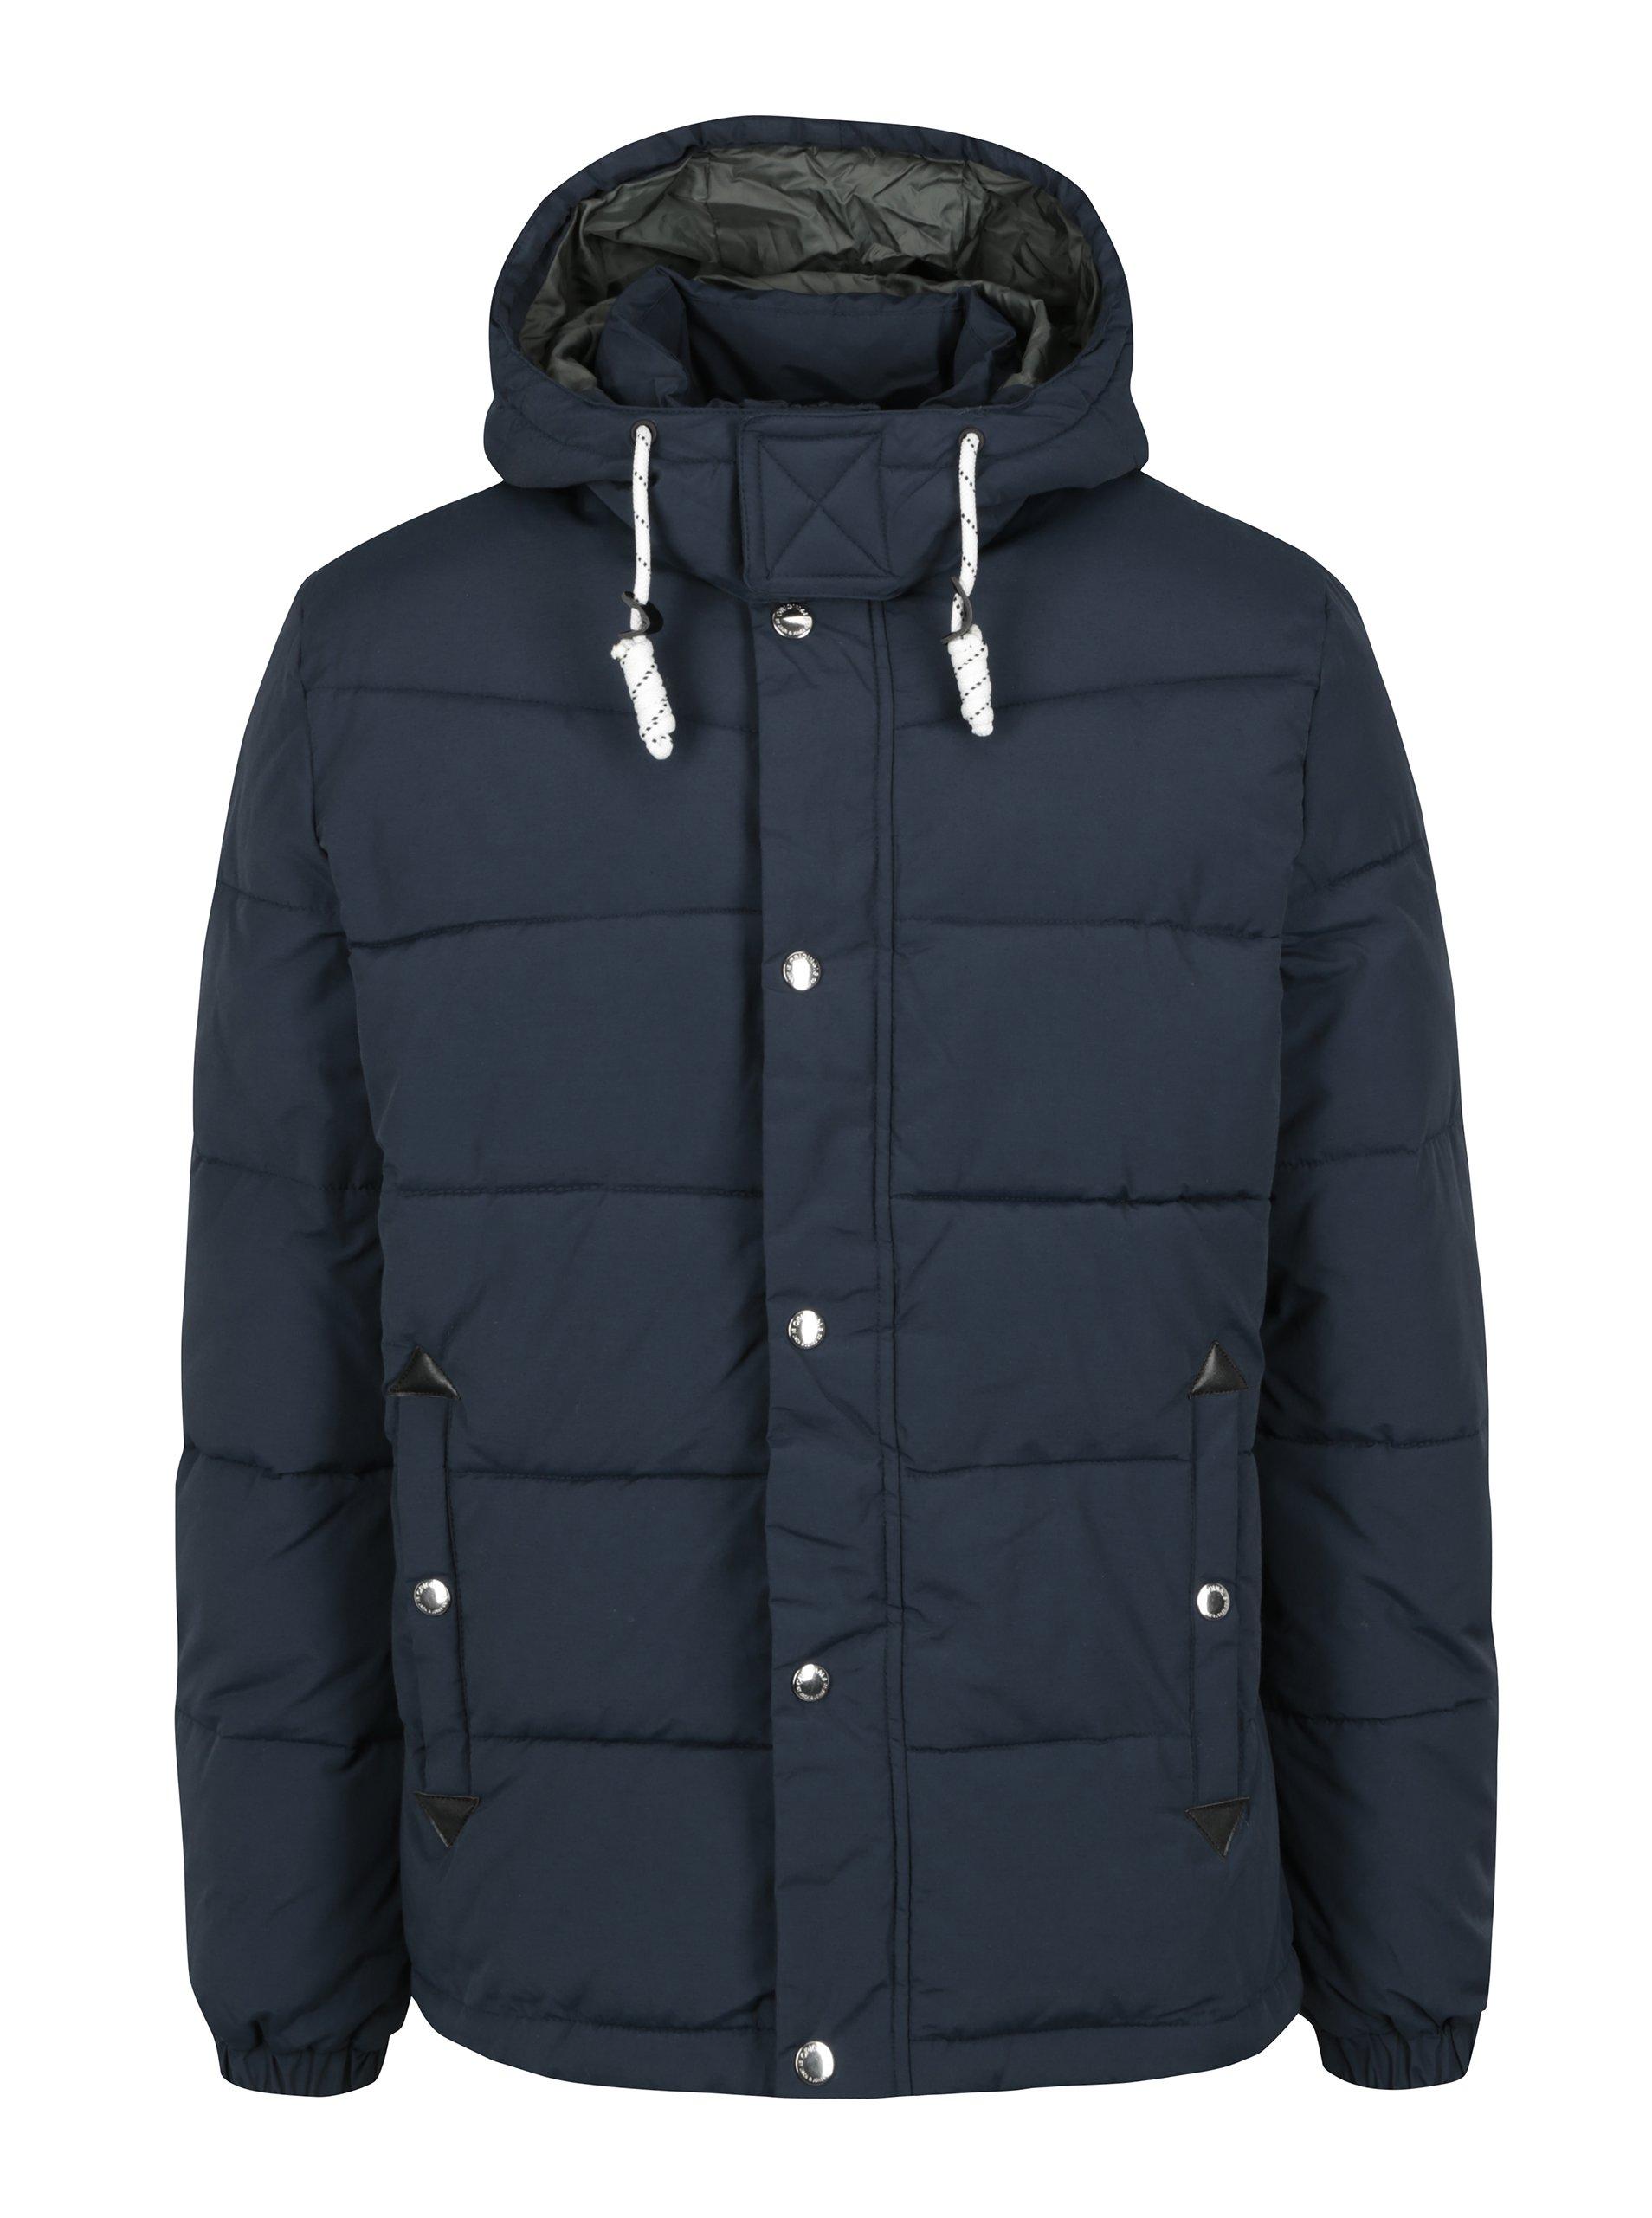 Tmavomodrá zimná prešívaná bunda s kapucňou Jack & Jones Figure